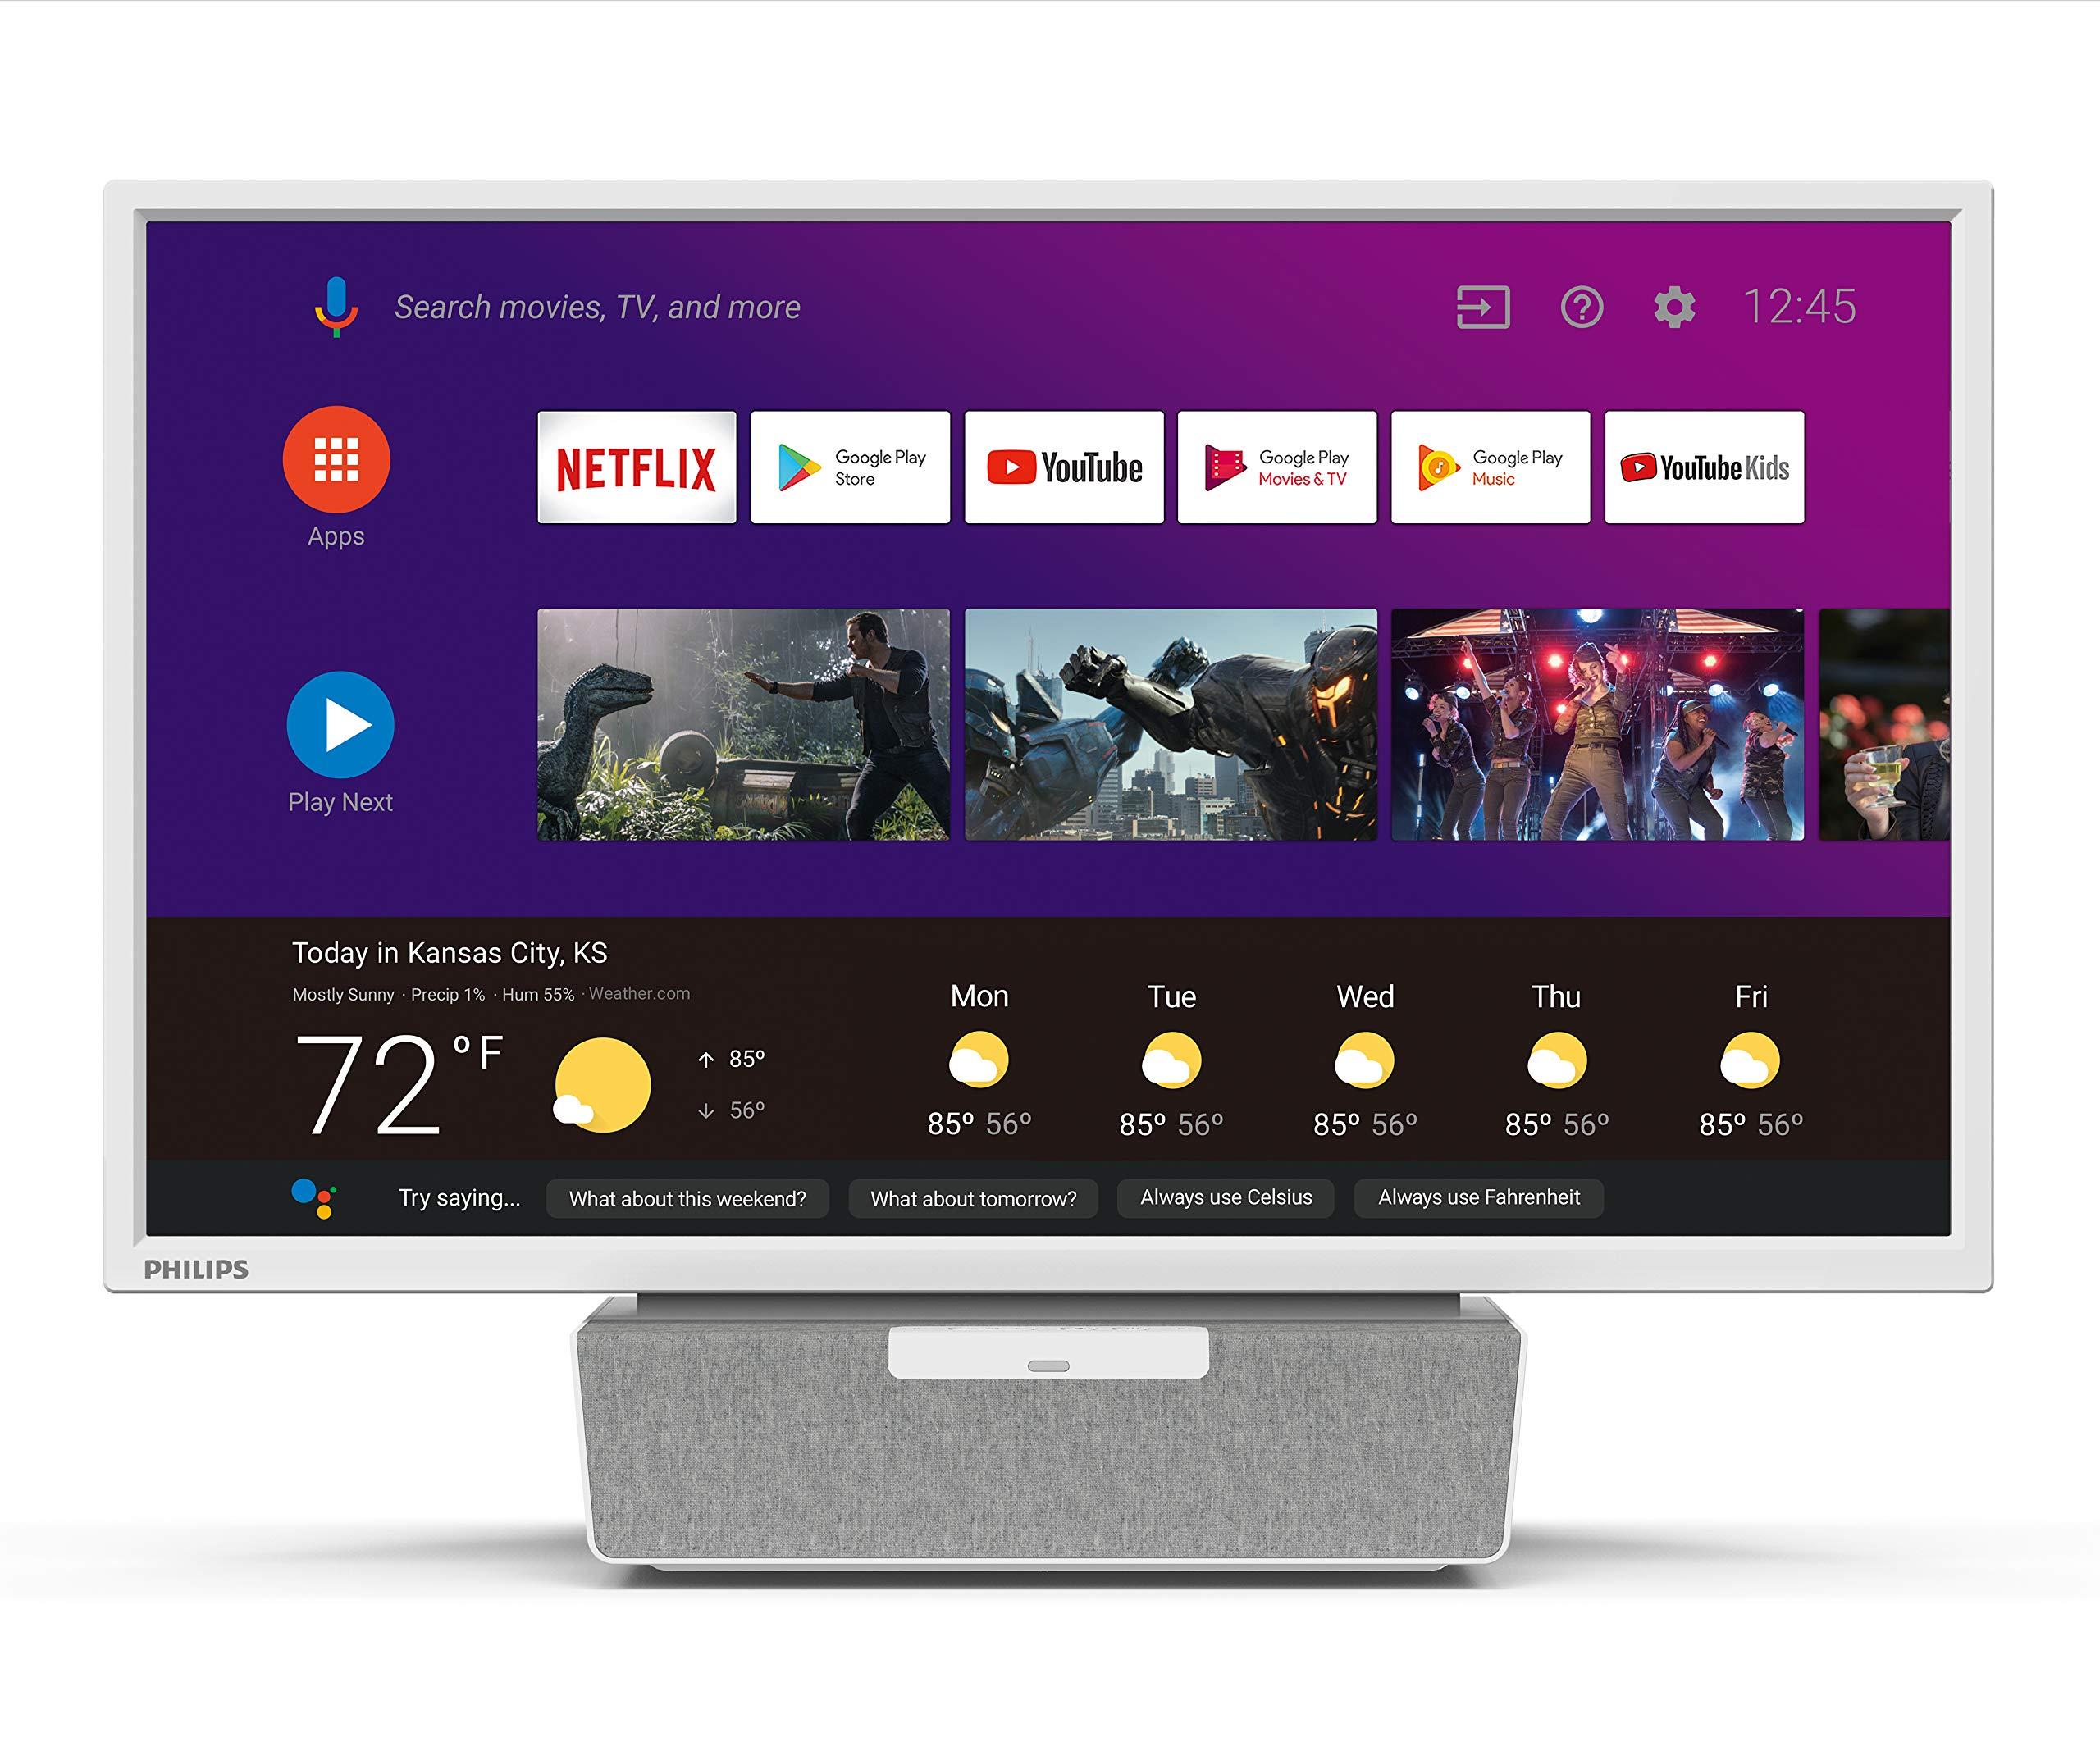 50PFL5704//F7 65PFL5504//F7 65PFL5604//F7 50PFL5604//F7 43PFL5704//F7 65PFL5704//F7 Philips NH800UP Android TV Remote /& Google Voice Assistance 43PFL5604//F7 55PFL5704//F7 55PFL5604//F7